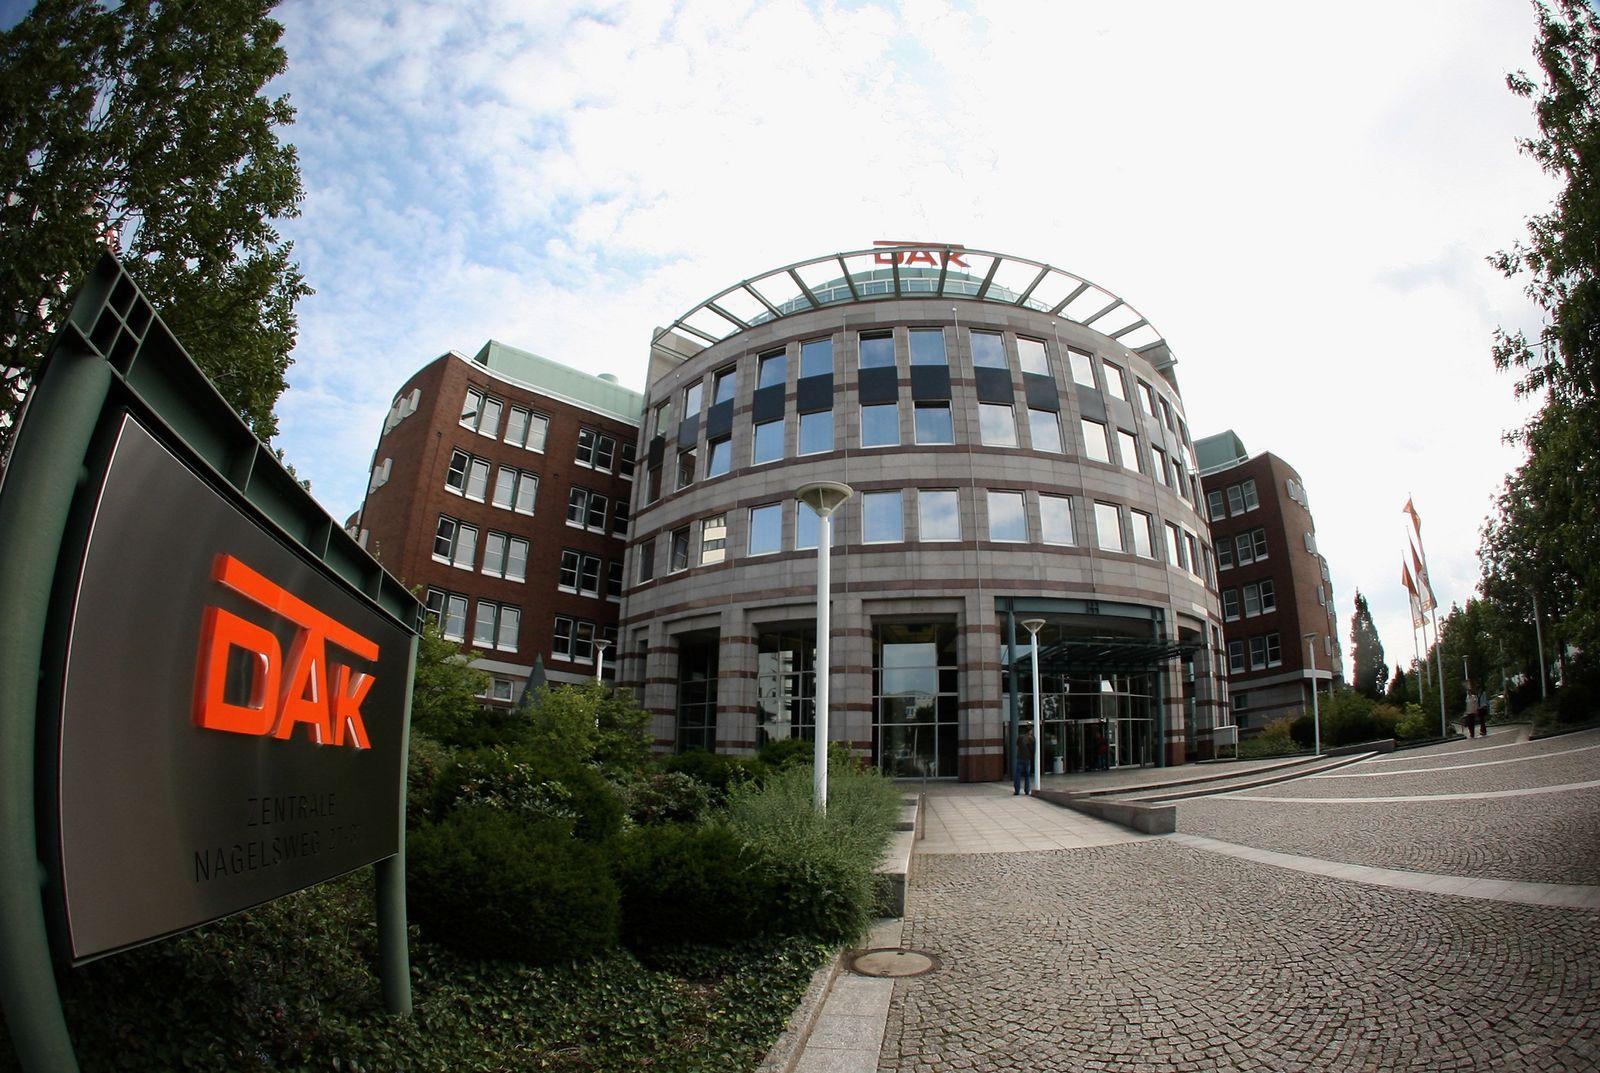 DAK / Hamburg